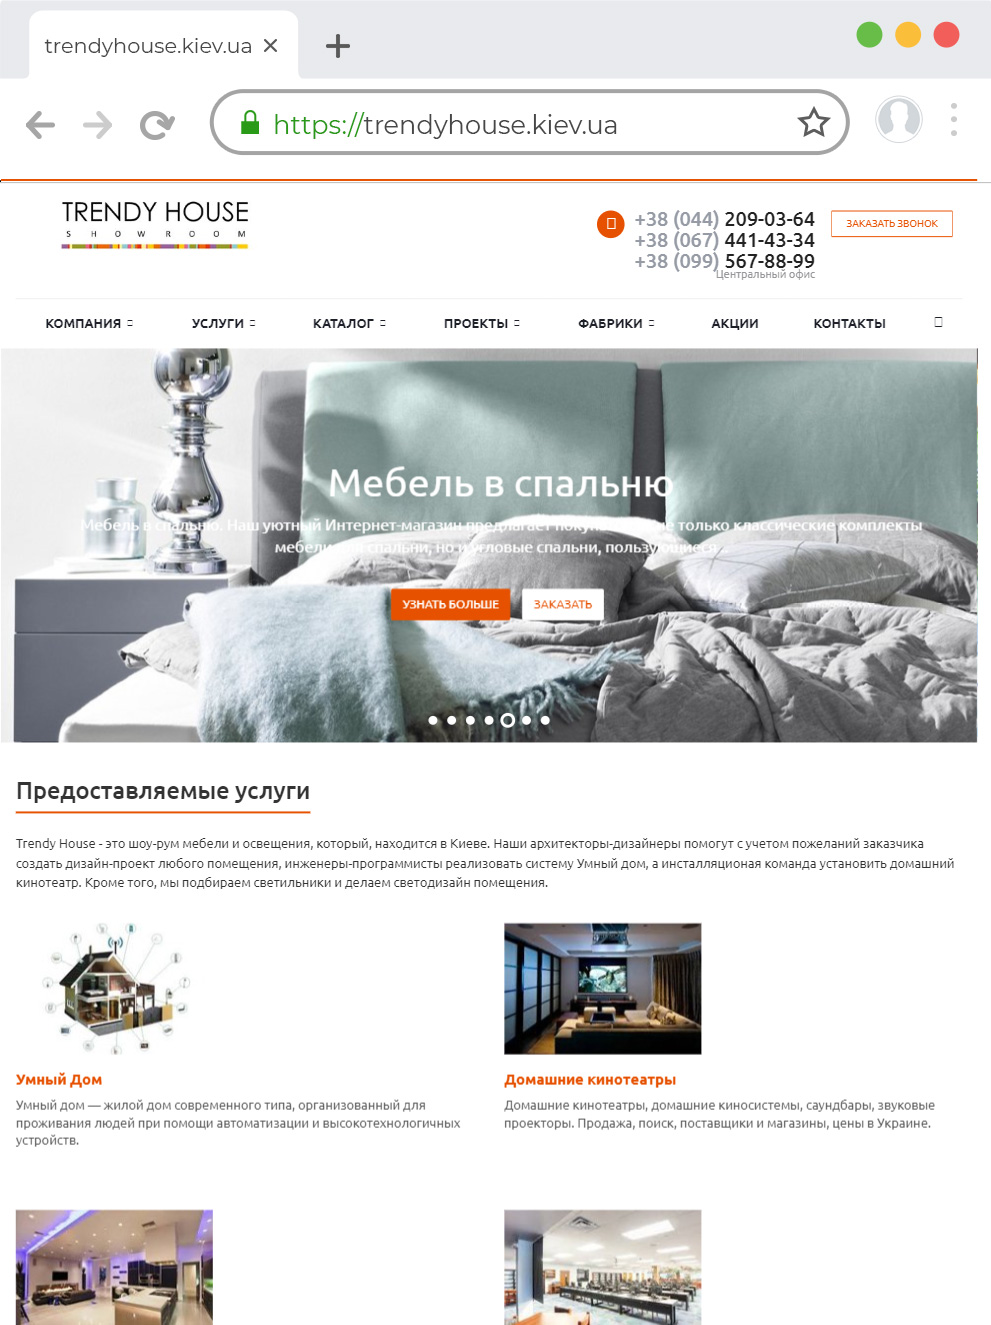 Разработка интернет магазина на Битрксе Trendy House